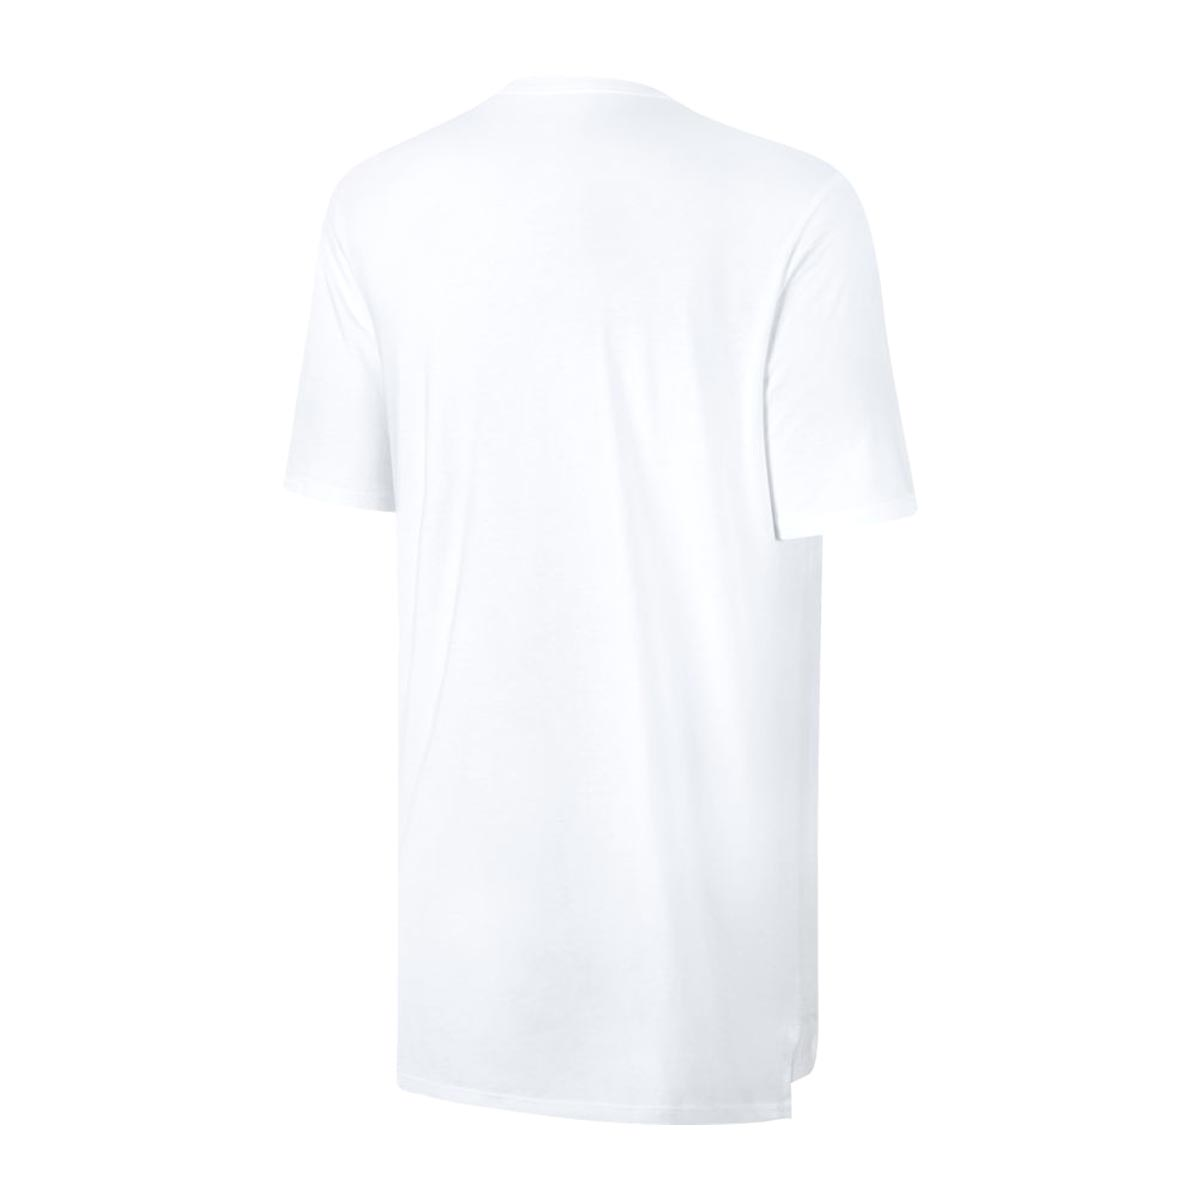 NIKE AS M NSW TEE DRPTL OVRSZ SWSH (나이키드롭테이르오바사이즈스웃슈 T셔츠) WHITE/BLACK 17 FA-I